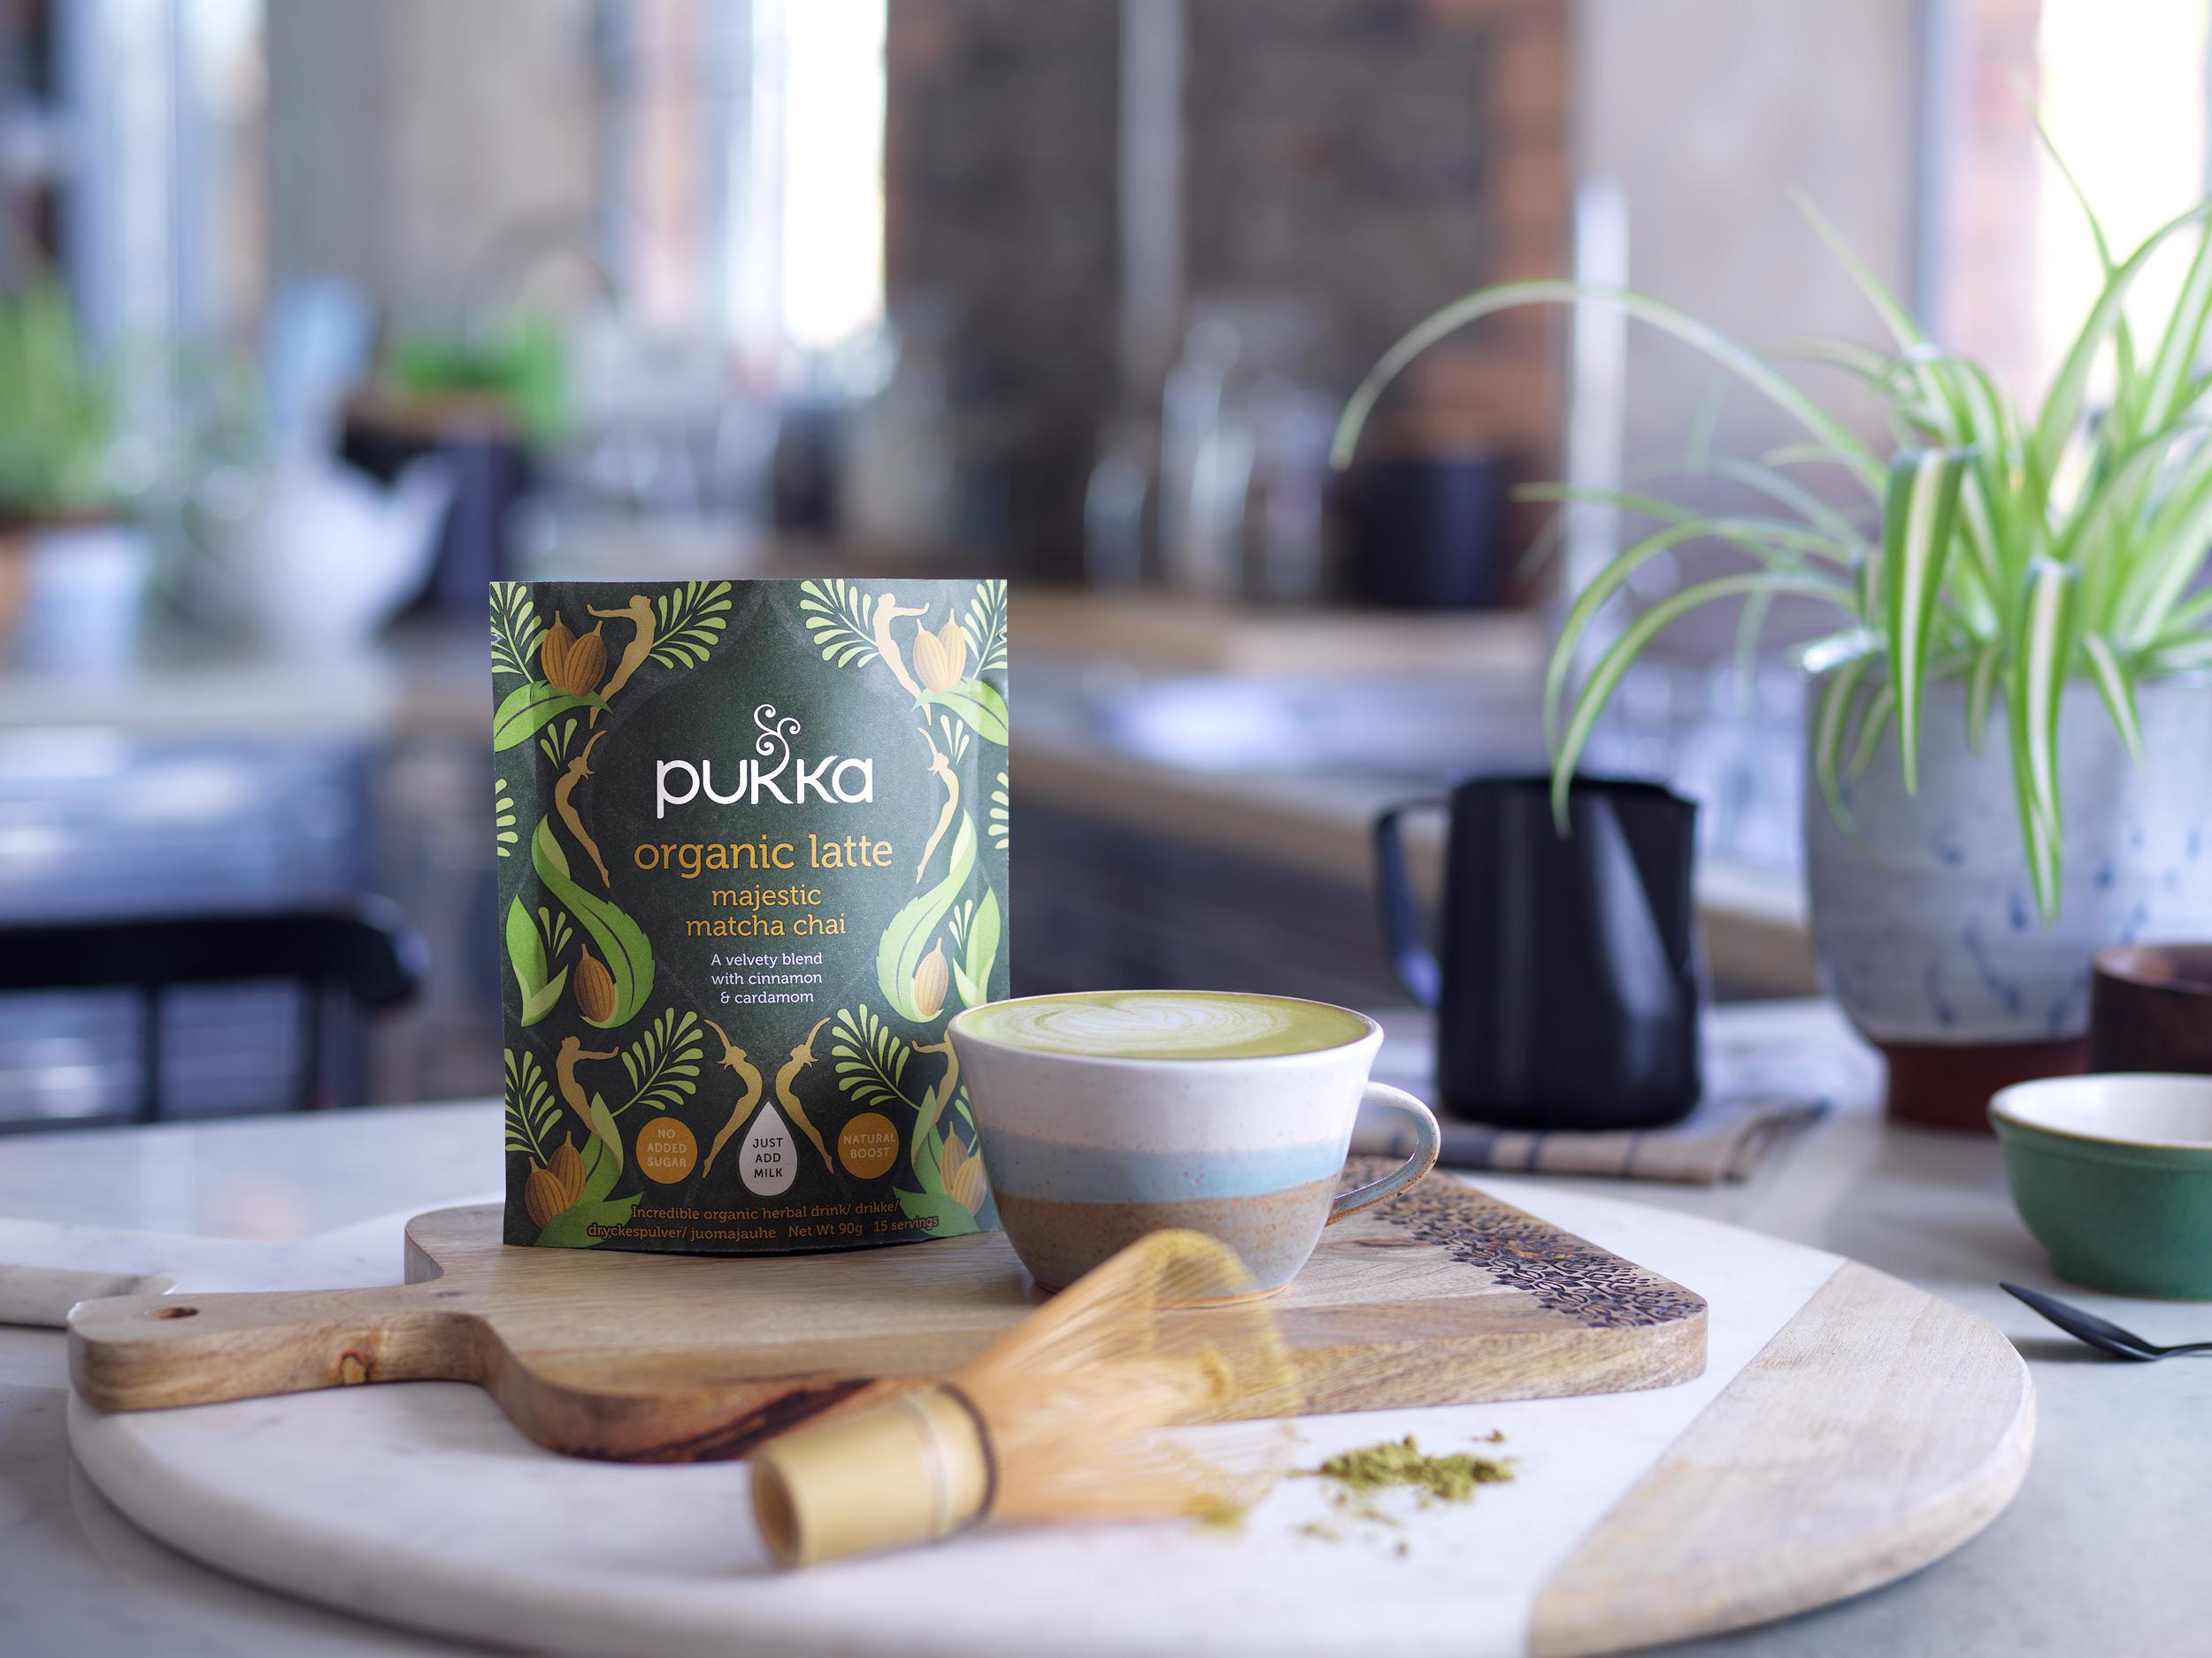 robvanderplank_Pukka-Latte-Matcha-Hero-ENG.jpg